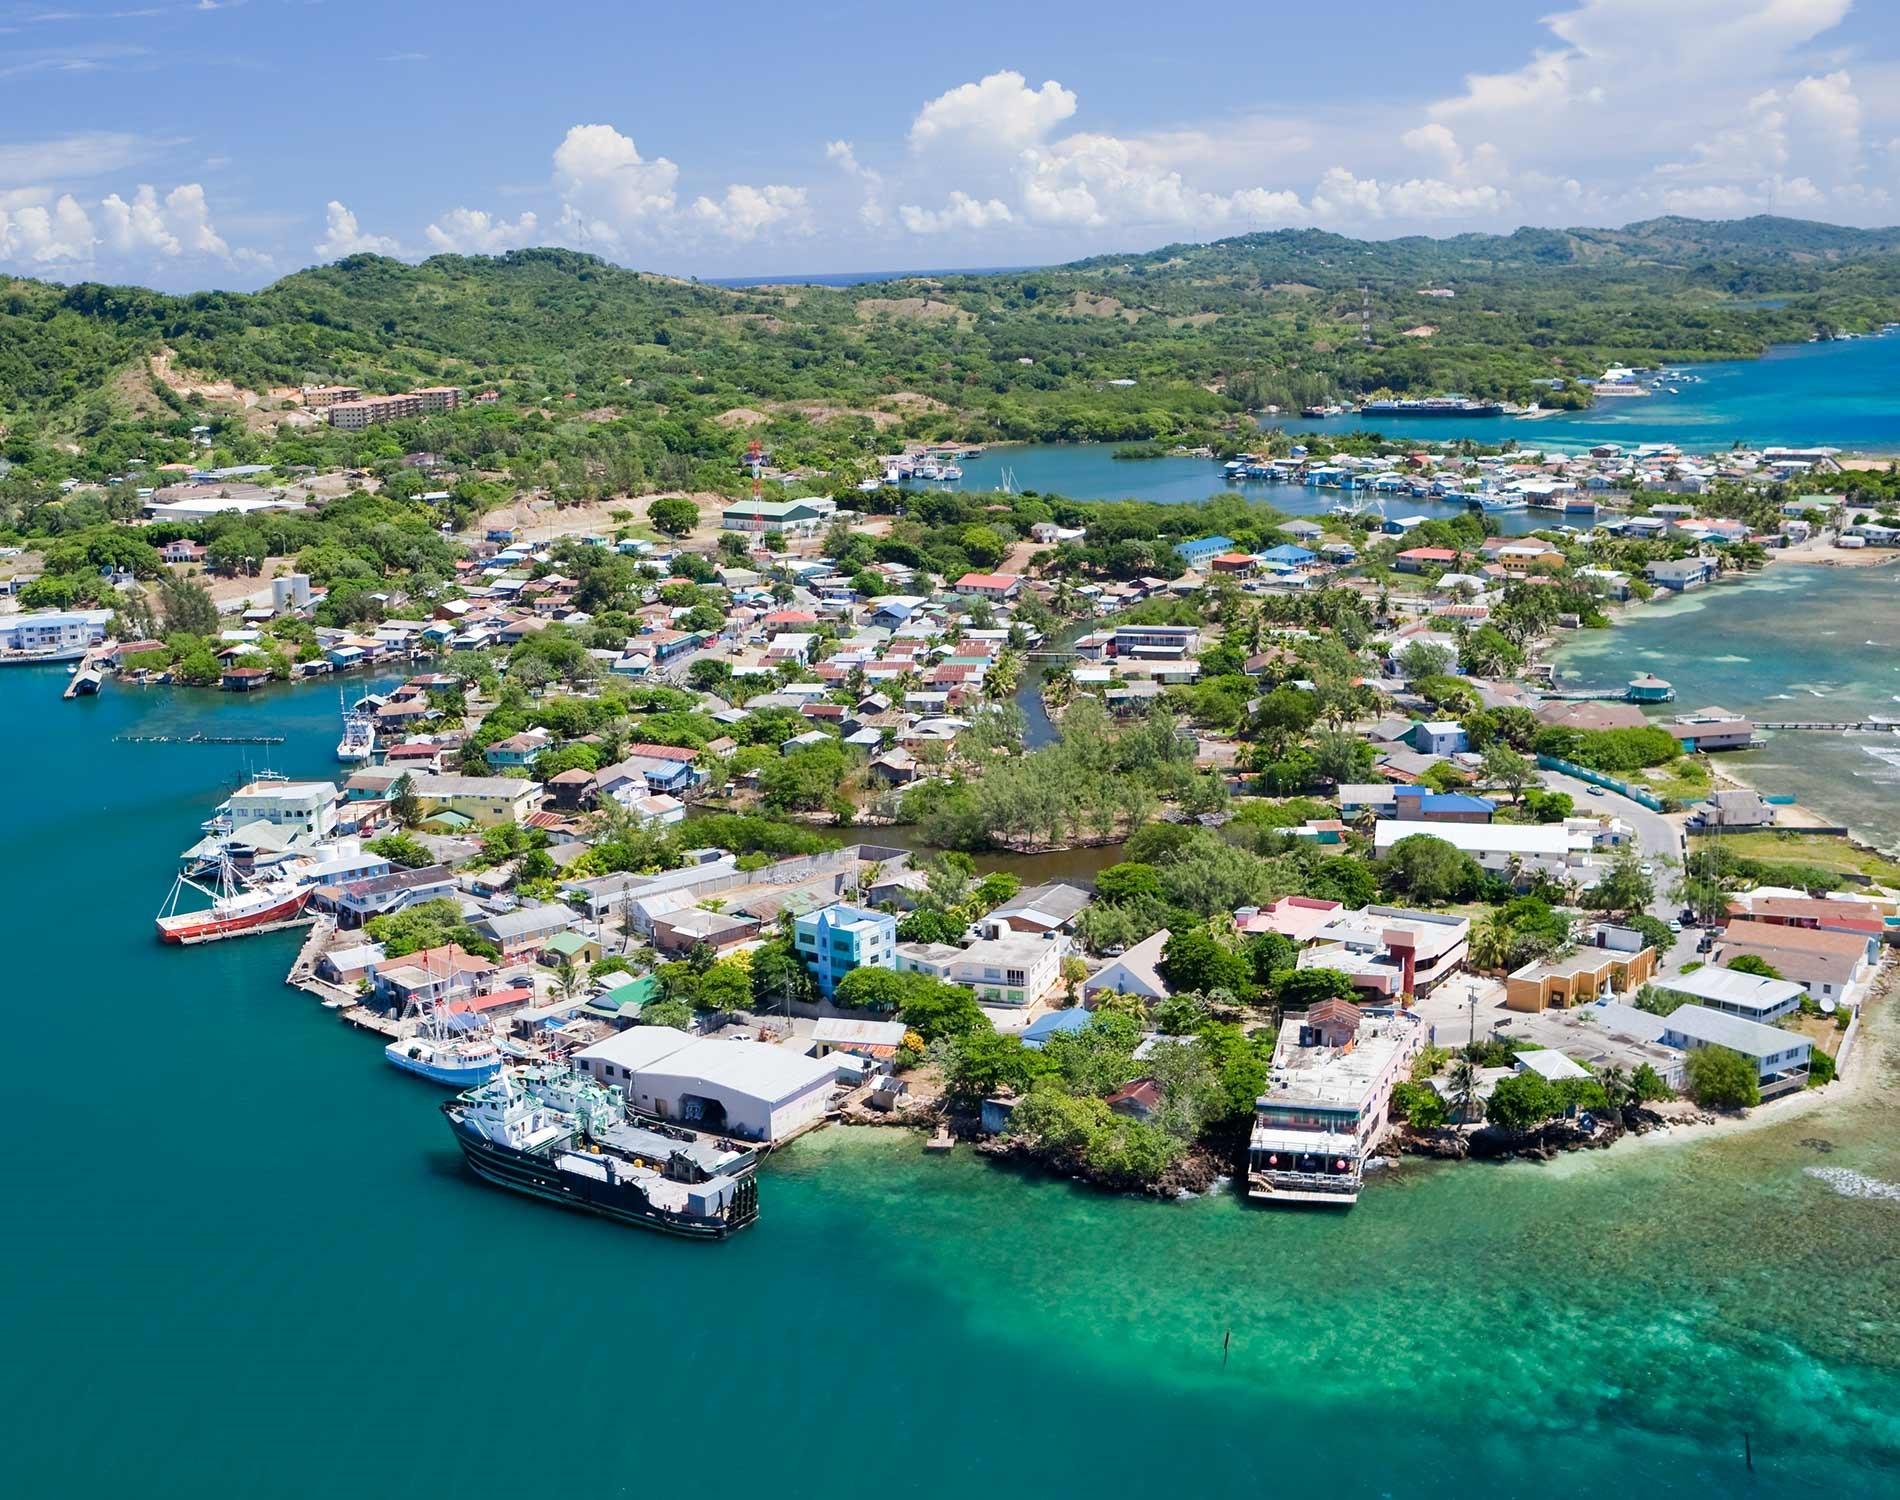 Honduras - Negara Dengan Tingkat Kriminal Paling Tinggi di Dunia, Berani Pergi Ke Sana